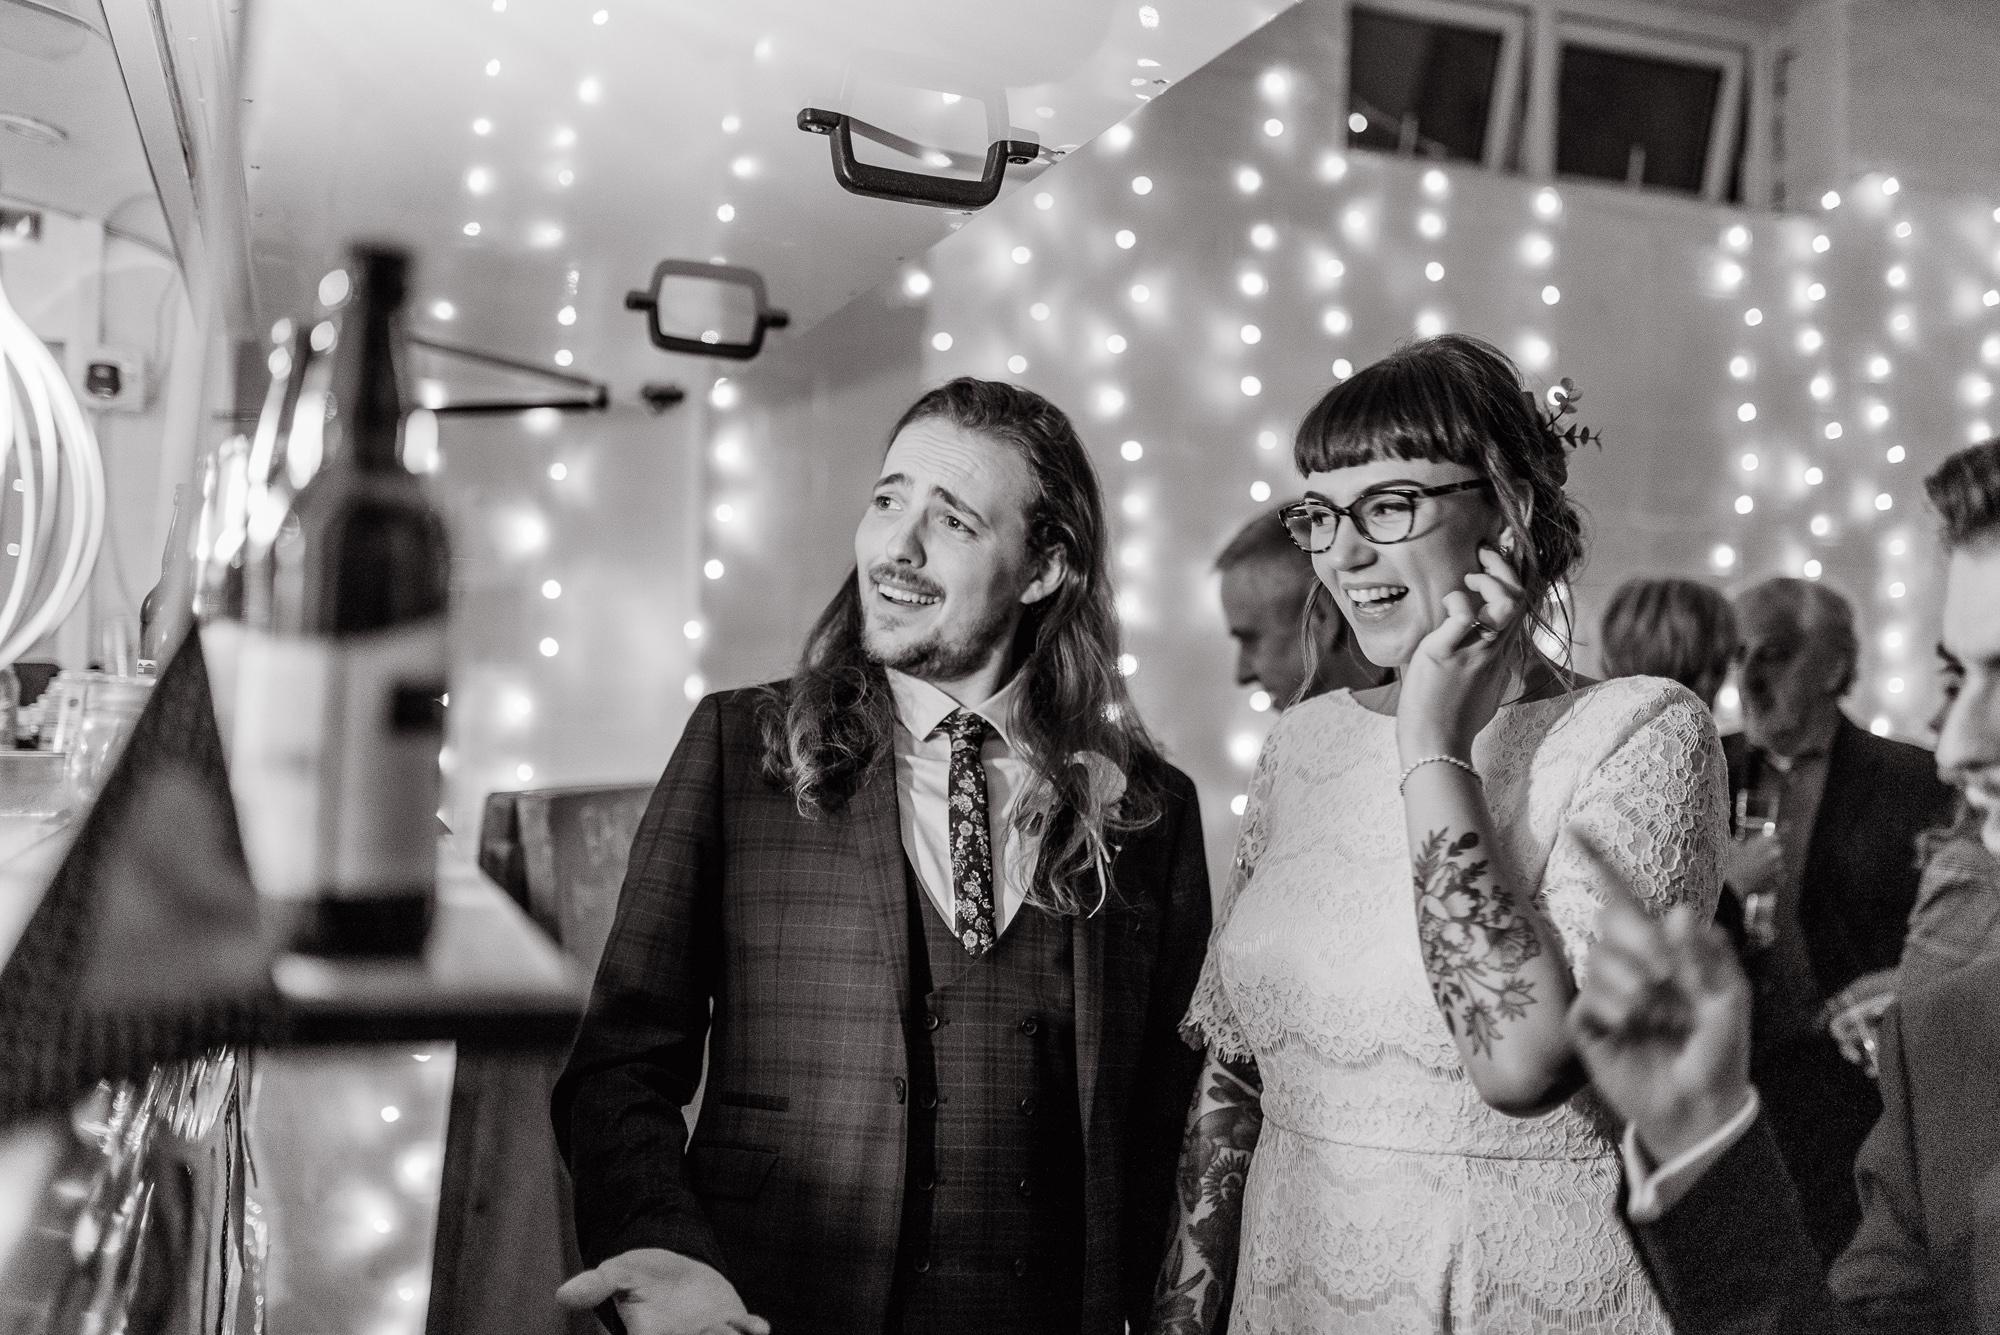 Harriet-Dahlia-Bespoke-Lace-Silk-Bohemian-Wedding-Dress-Sleeves-Tattooed-Bride-Alternative-Wedding-Sheffield-42.jpg